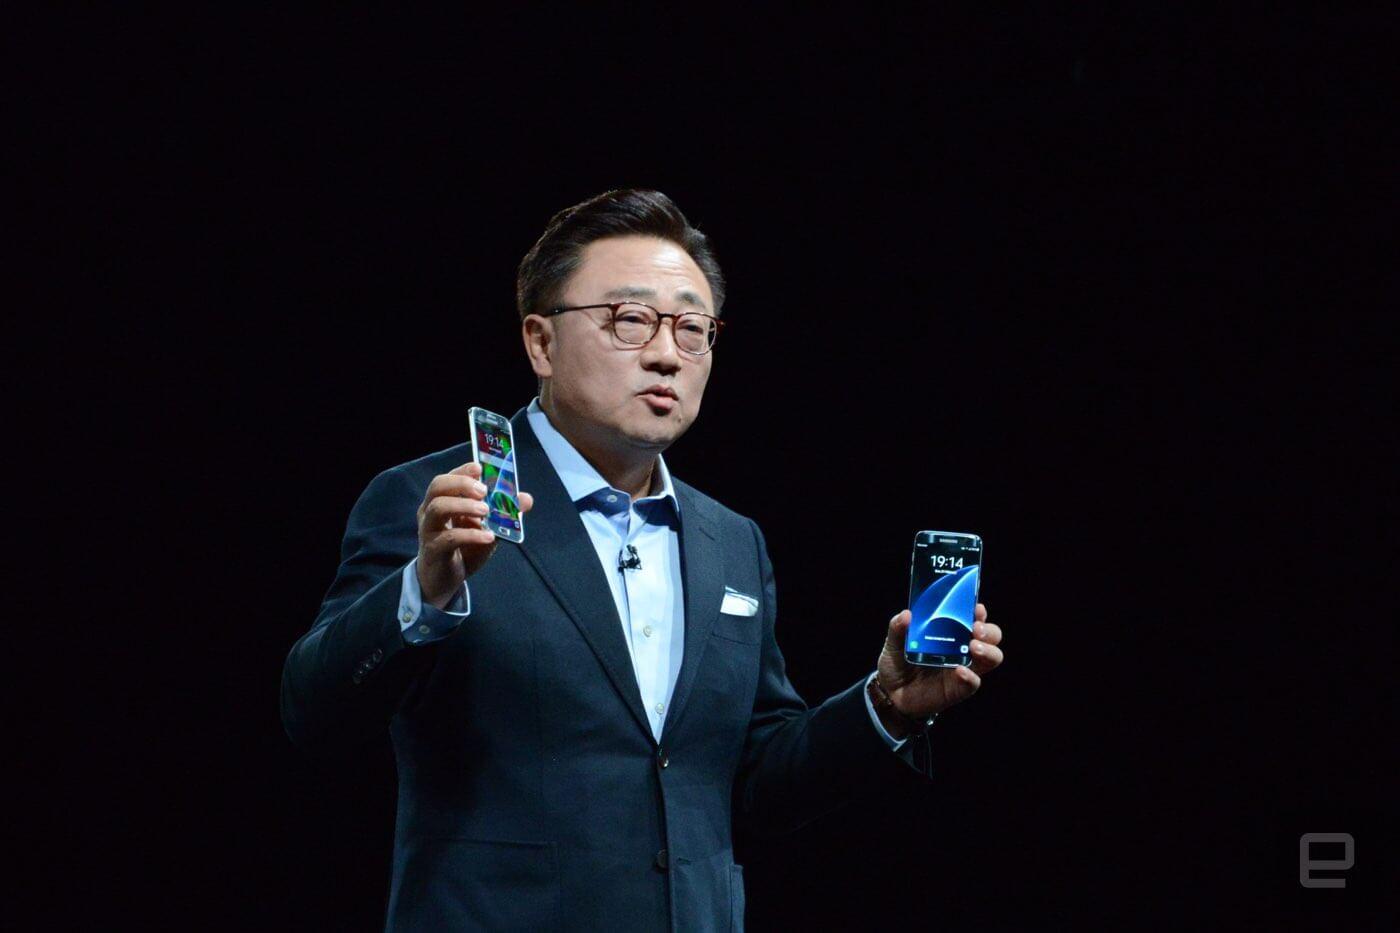 Samsung Galaxy S7 и Edge - состоялся анонс